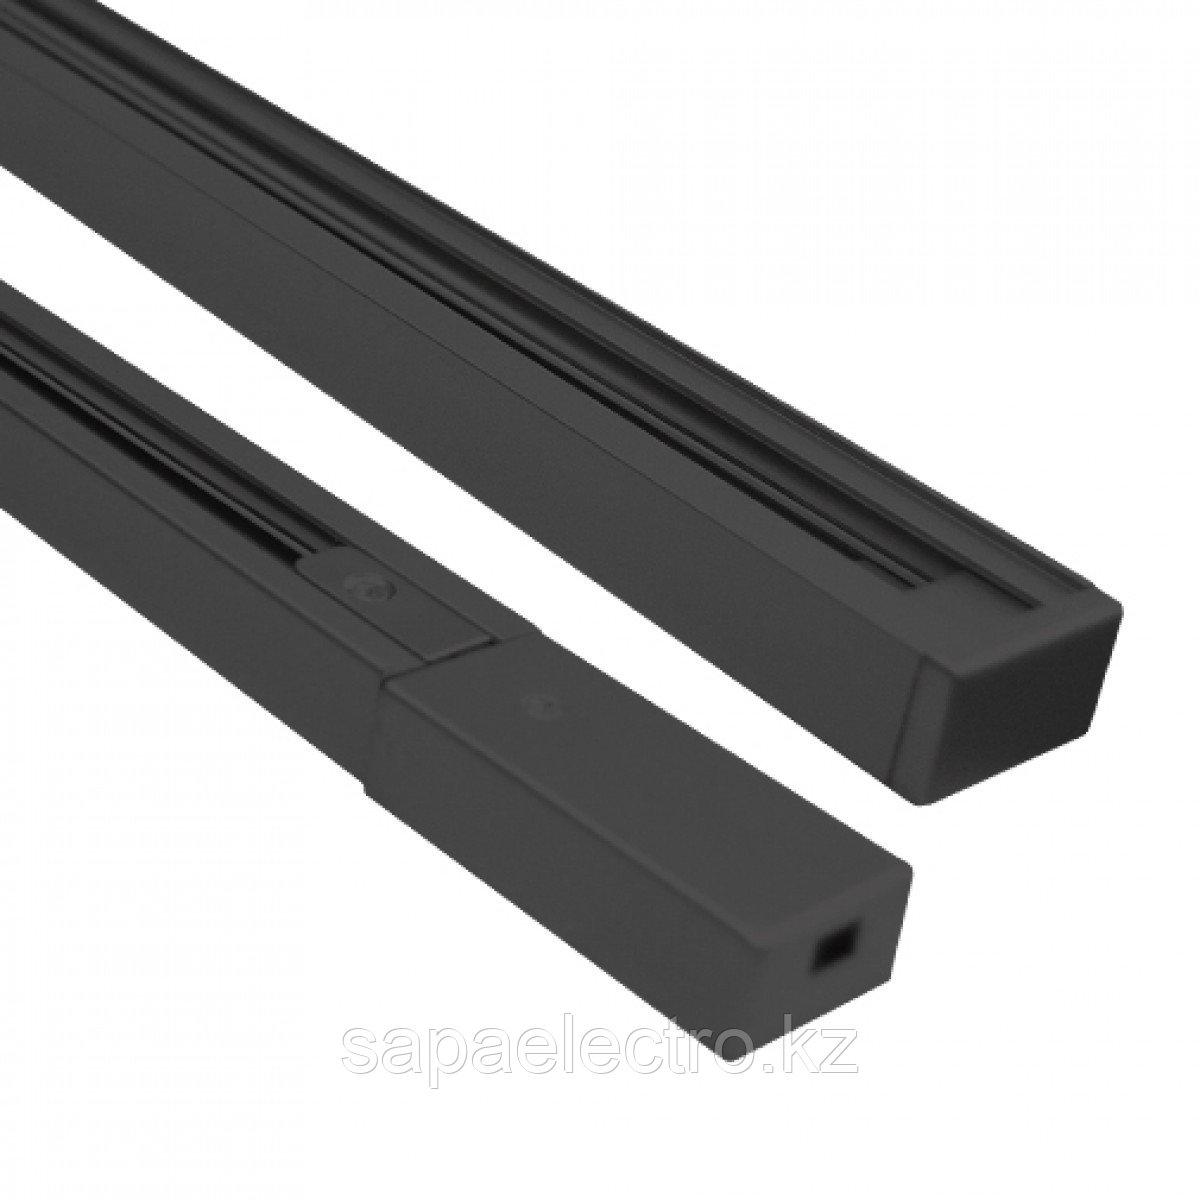 TRACK M. BLACK  STANDART 4м (2 LINE)  (TEKSAN)20шт